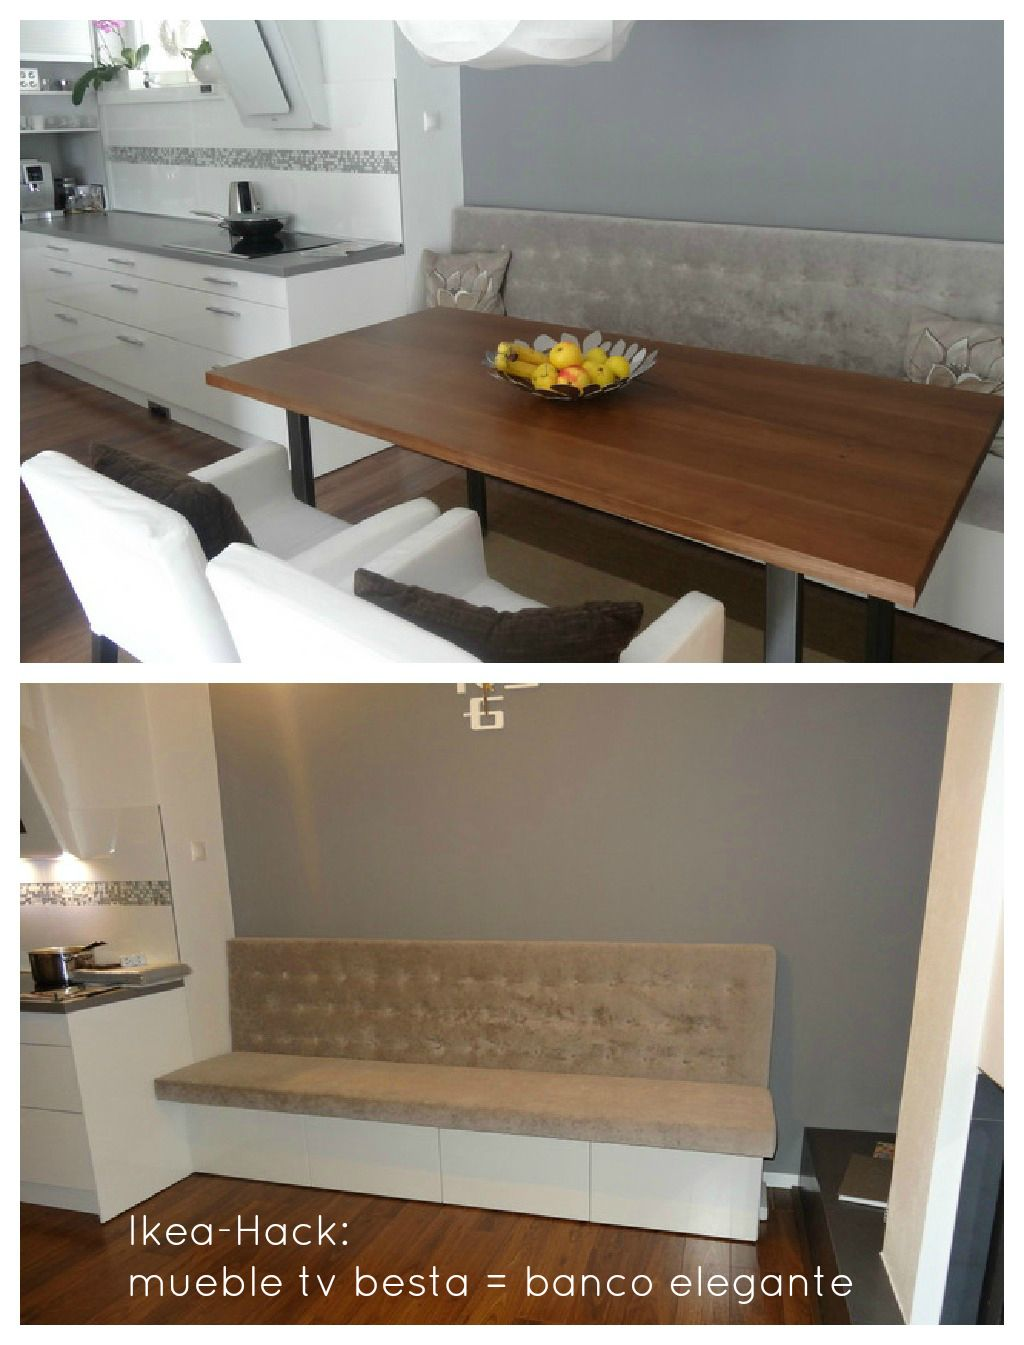 Ikea hack c mo convertir un mueble de tv - Muebles para tv ikea ...